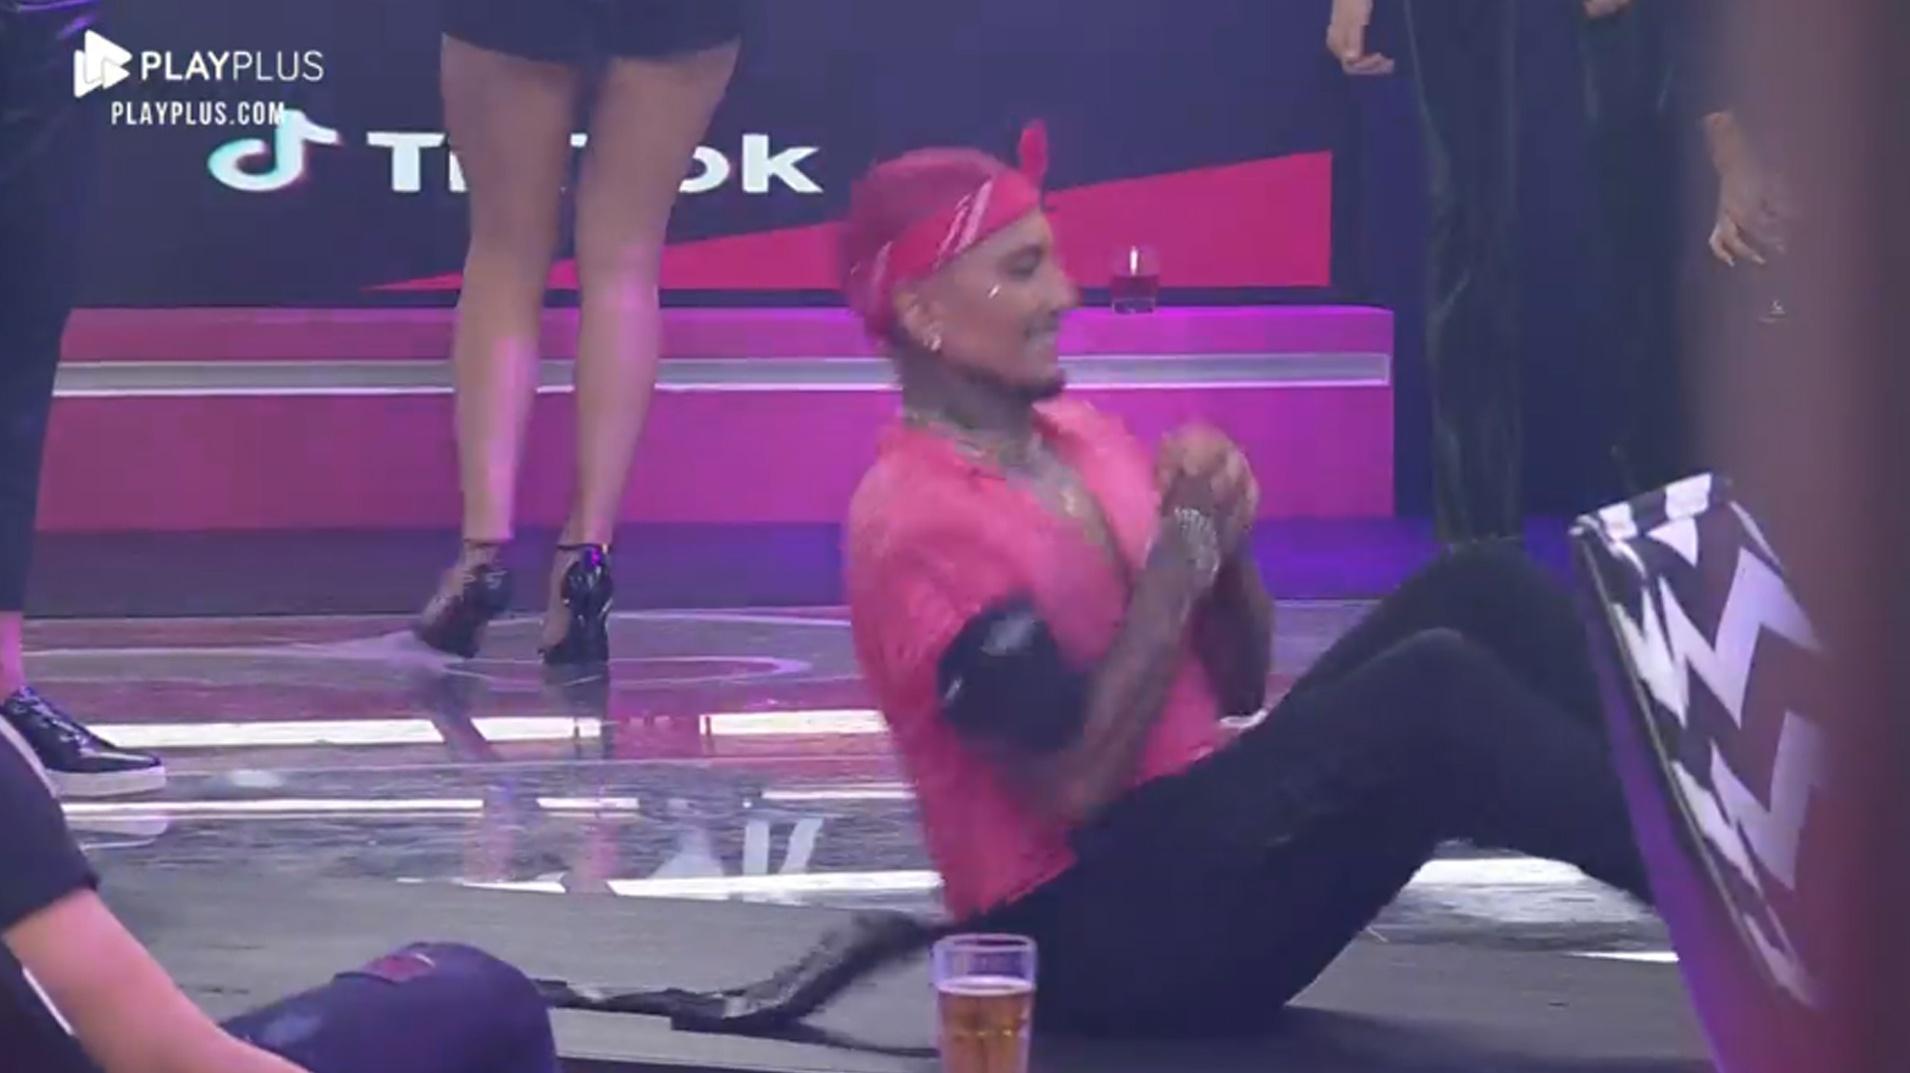 A Fazenda 2021: Dynho Alves trae un espectáculo de baile en la fiesta - clon / Playplus